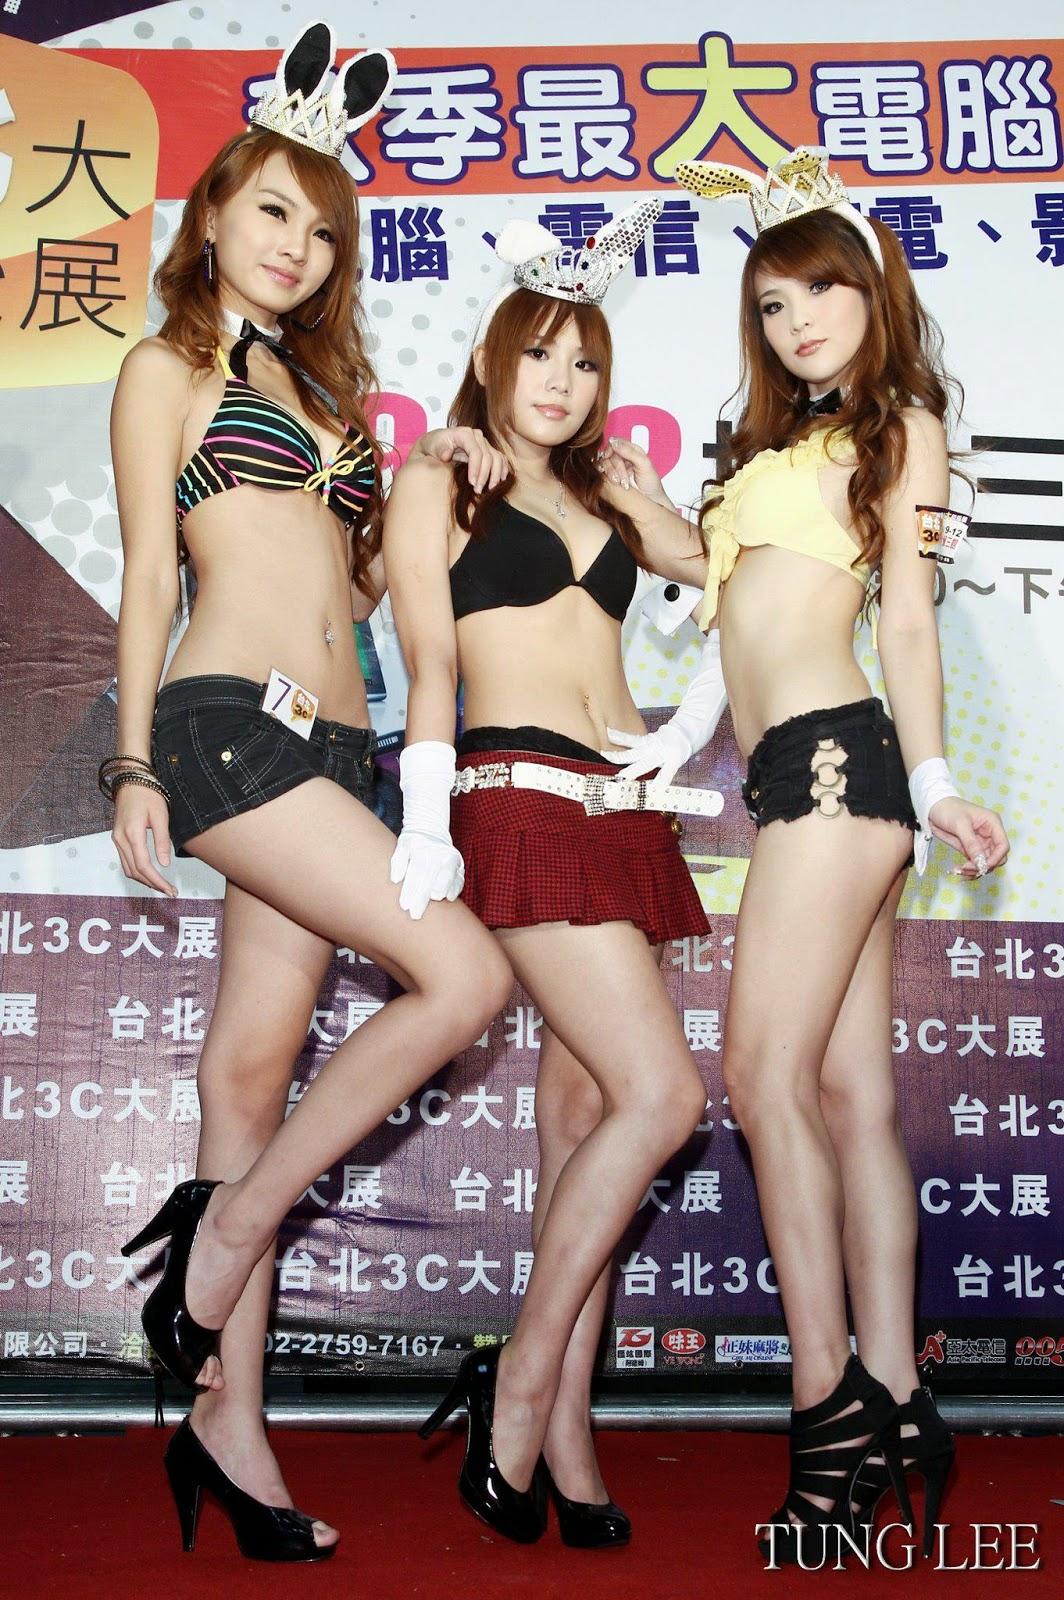 Jia-Ying Zhang  175Cm - Tall Woman - Height Comparison-4433